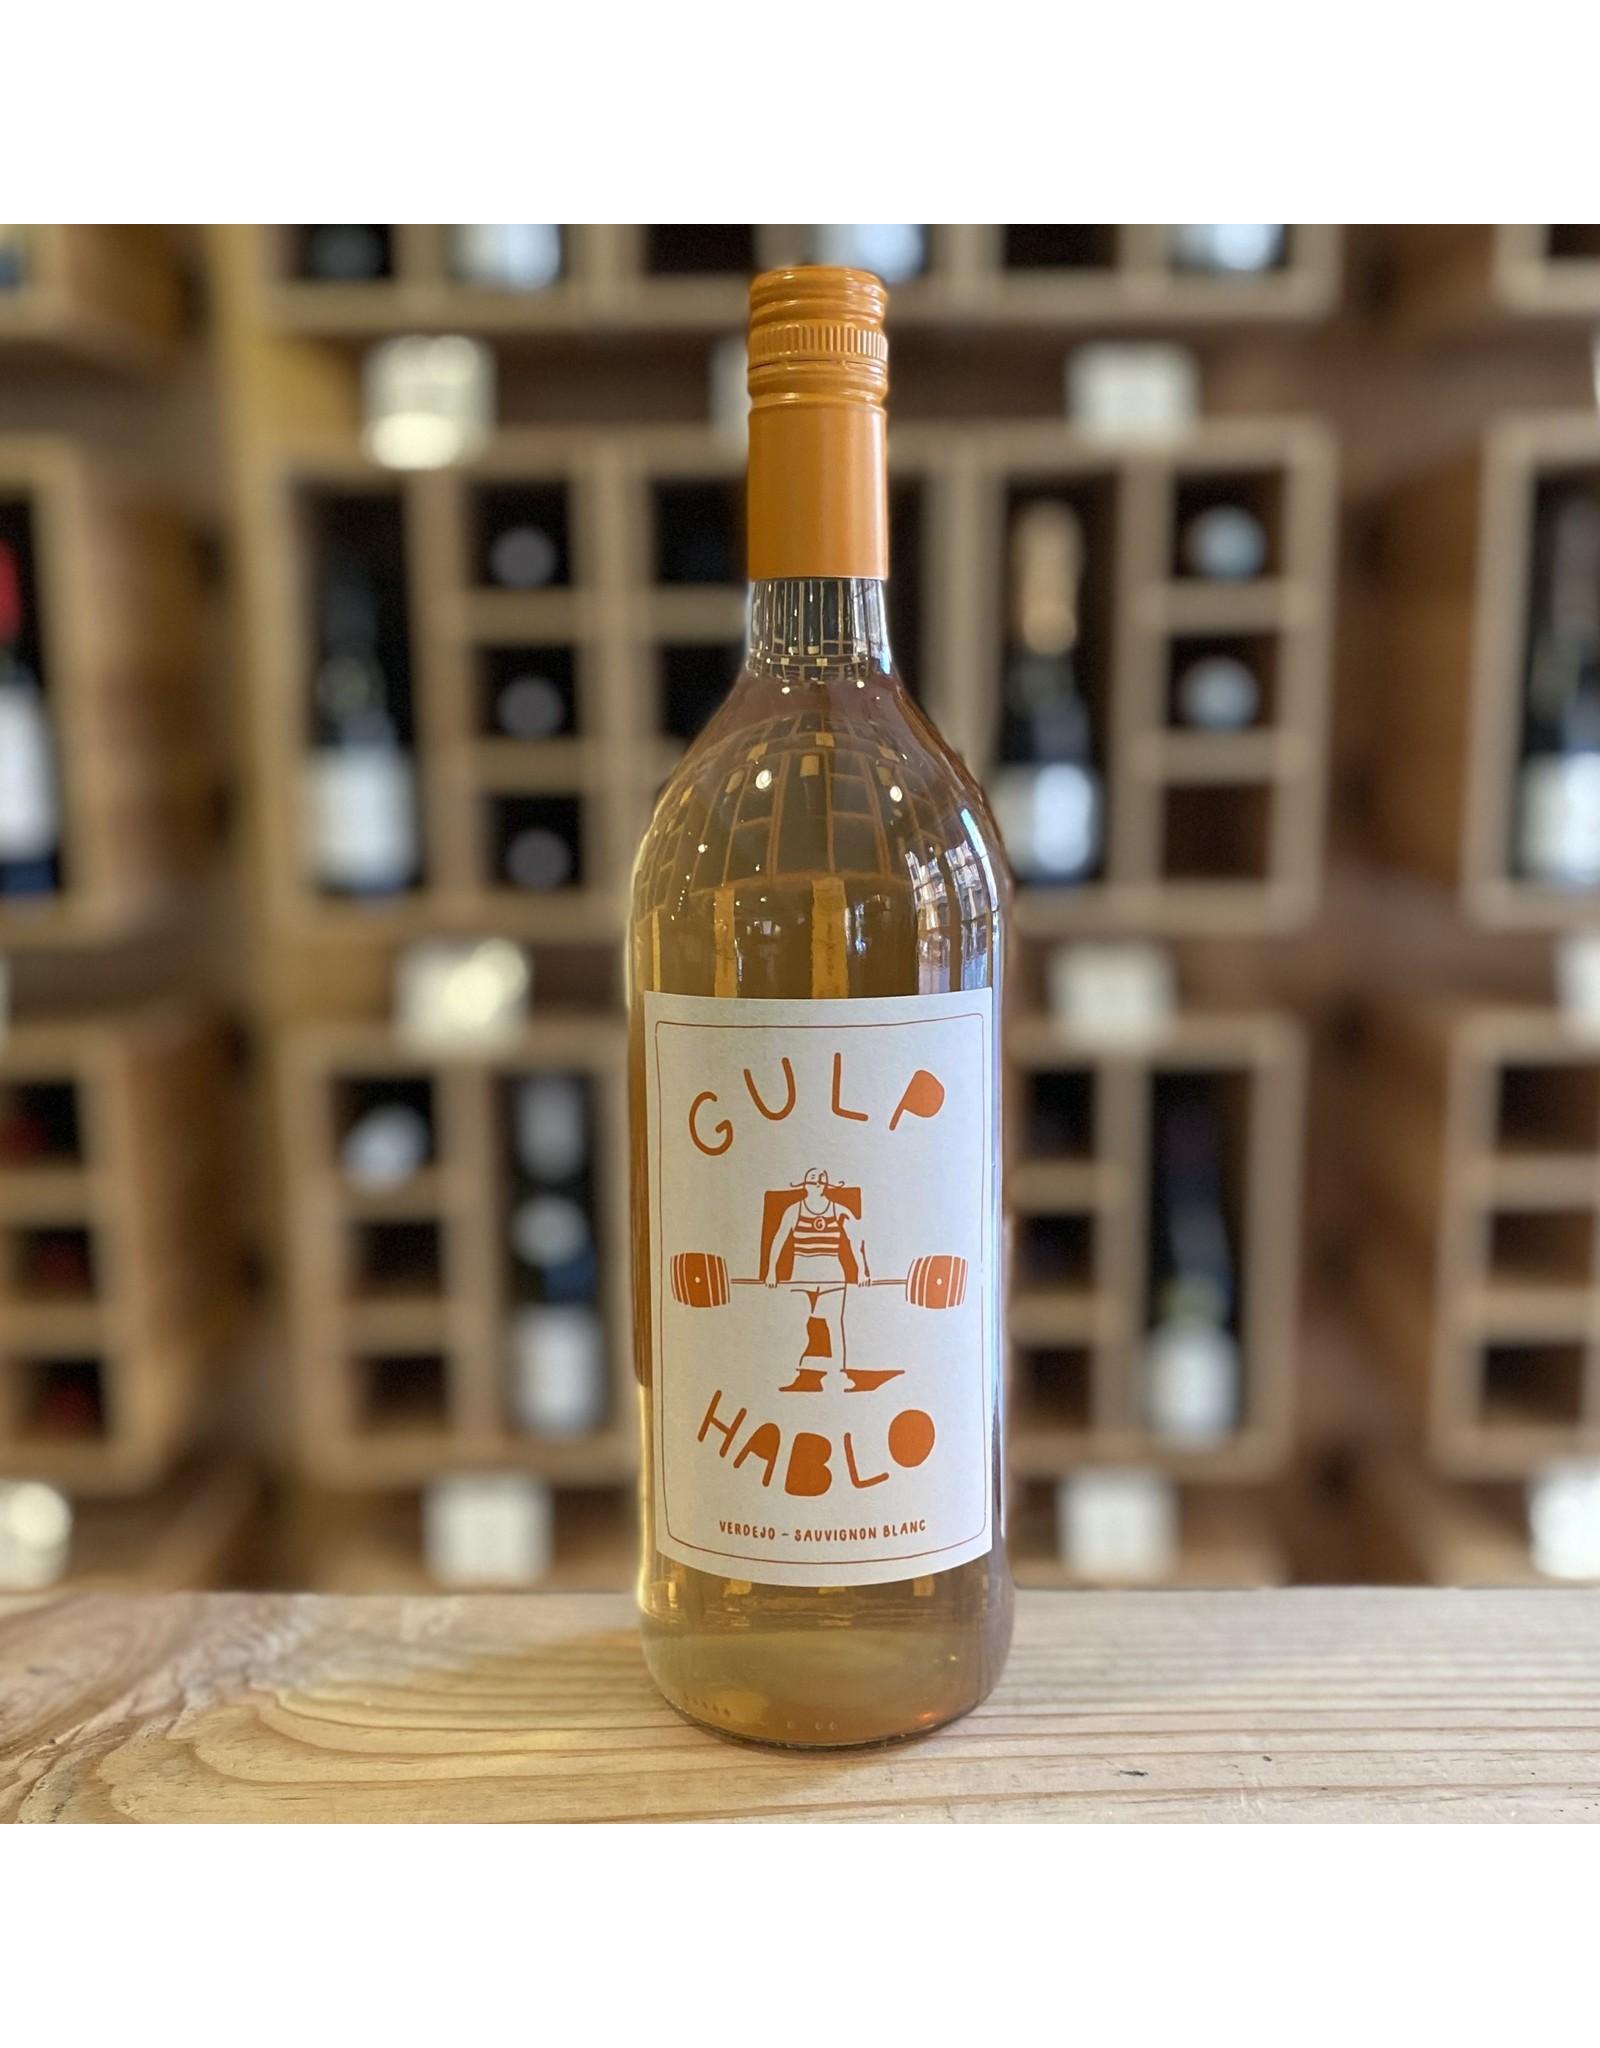 Organic Gulp/Hablo Skin-Fermented Verdejo/Sauvignon Blanc 2020 Liter Bottle - Castilla-La Mancha, Spain